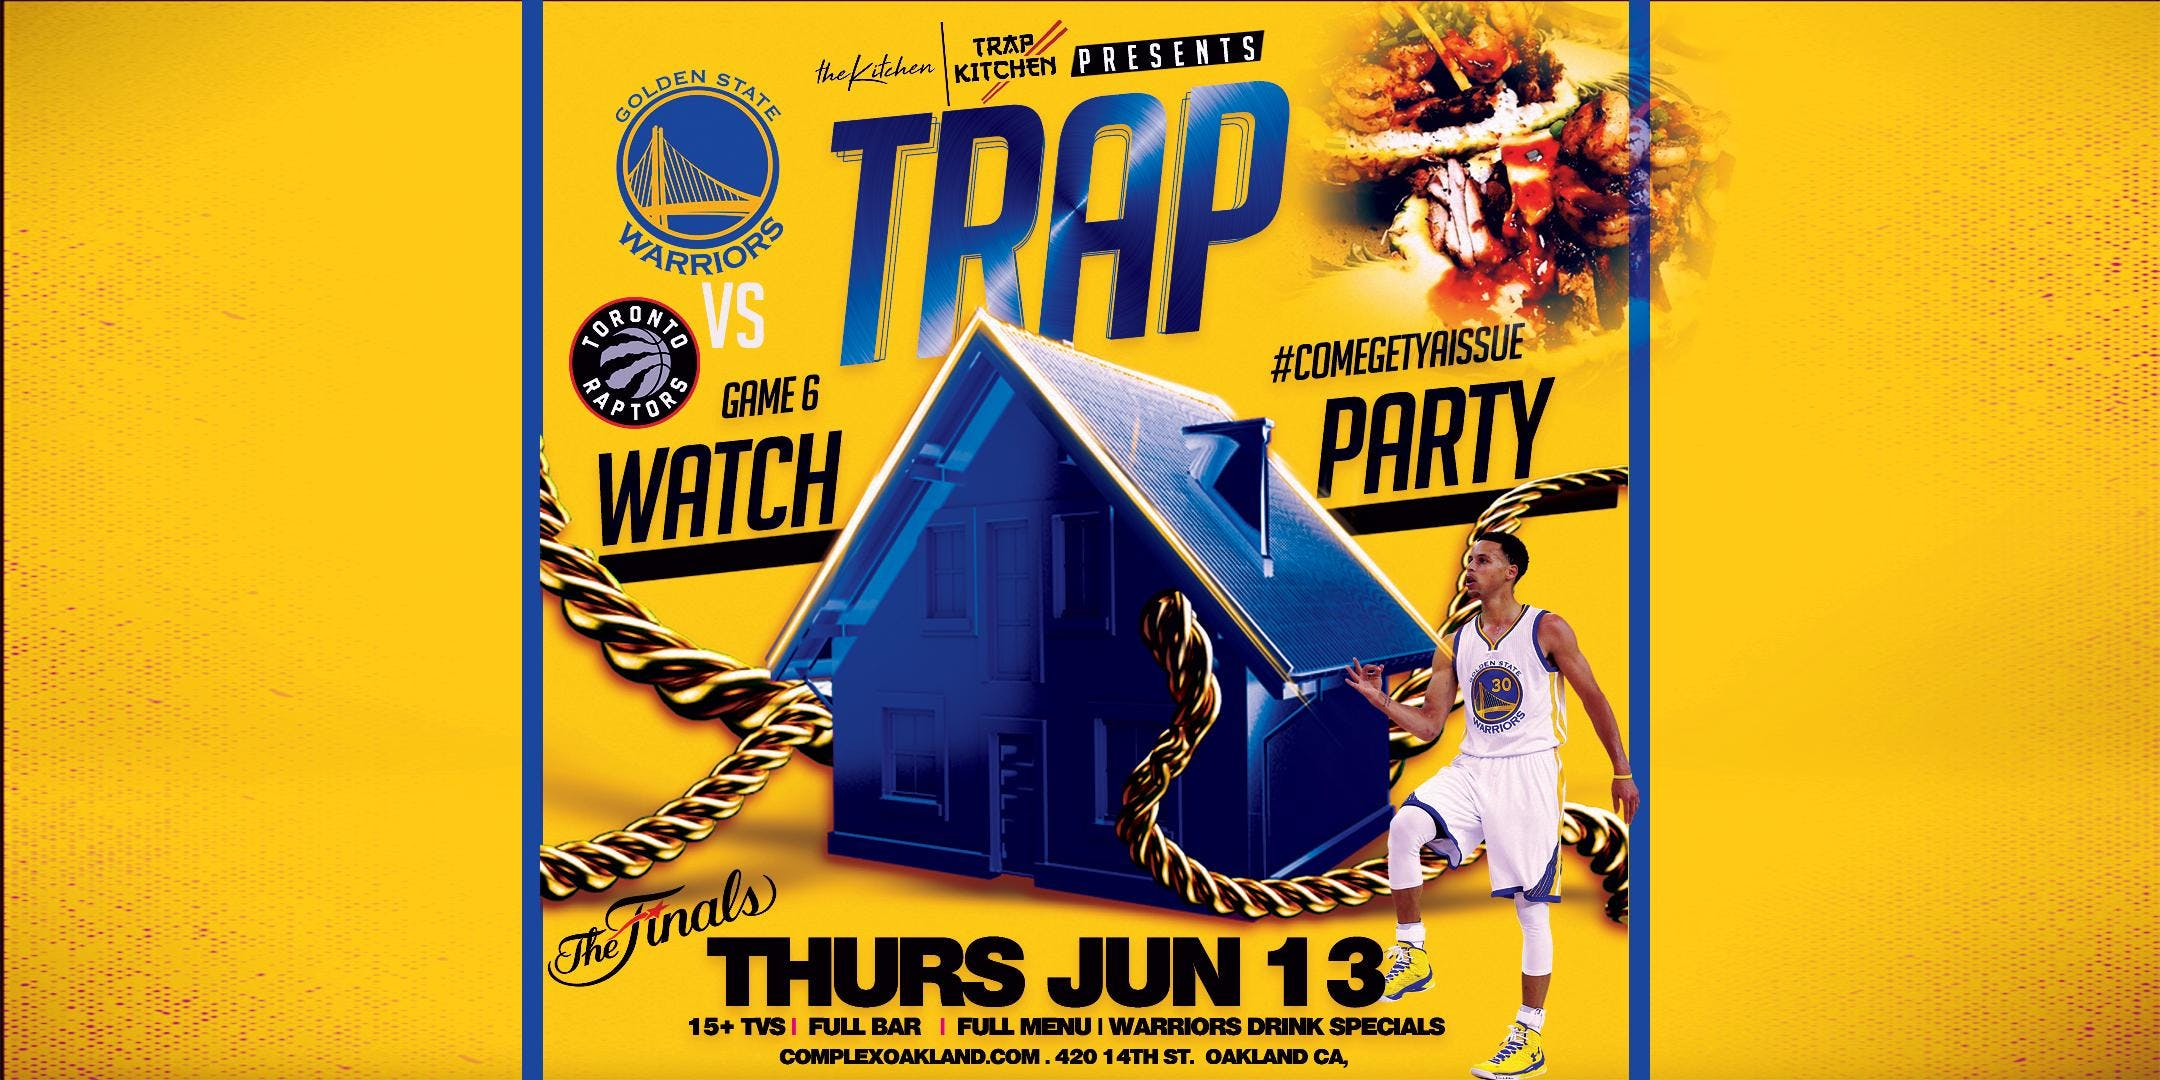 Trap Kitchen & The Kitchen: Warriors vs. Raptors GAME 6 Oakland Watch Party